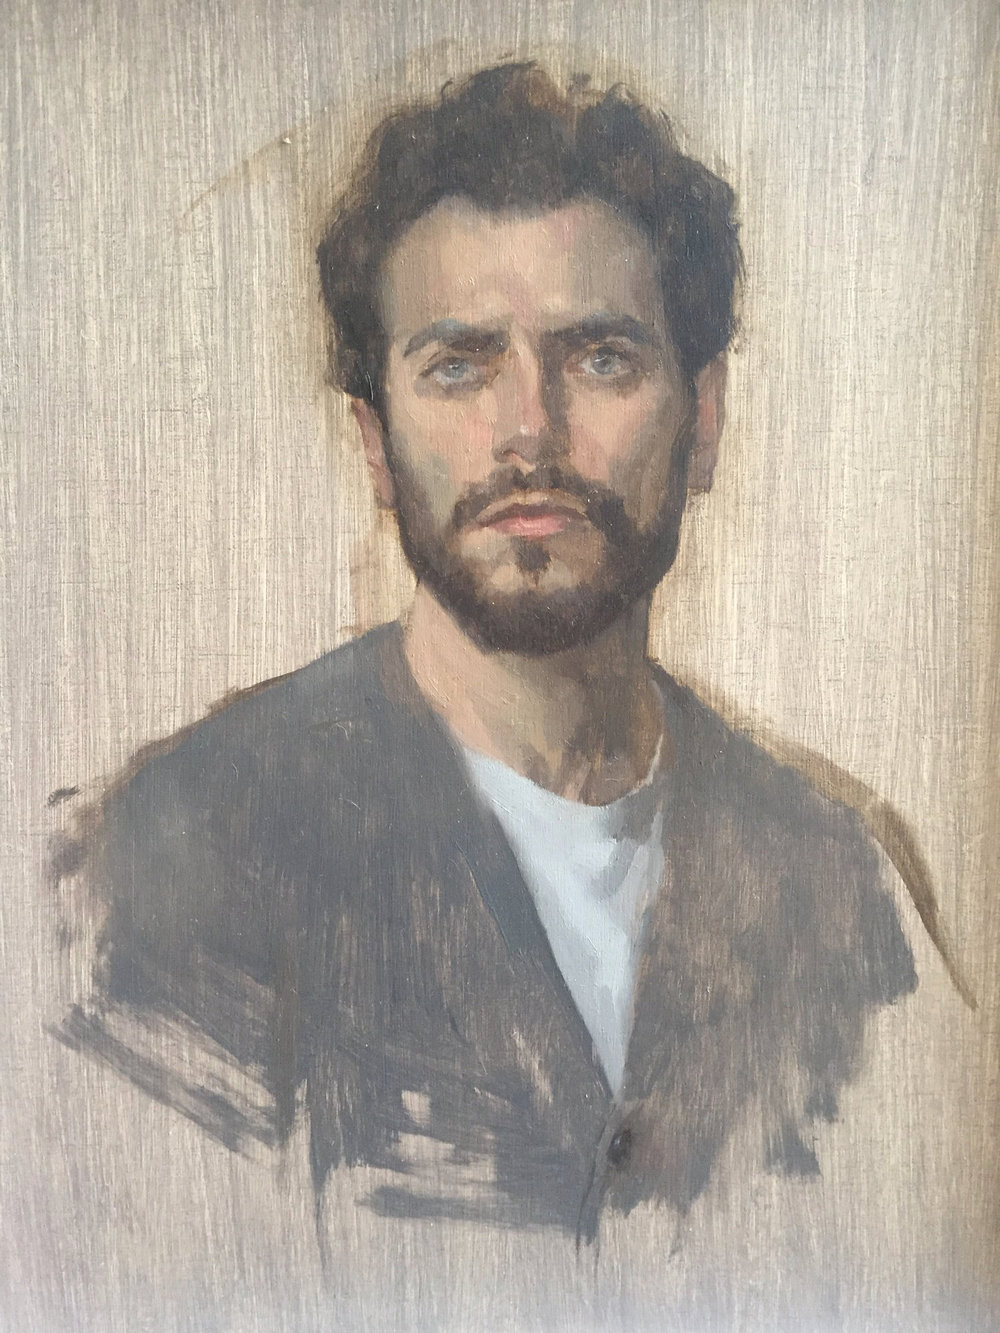 Danny - Portrait Sketch by Annastasia Pollard.jpg